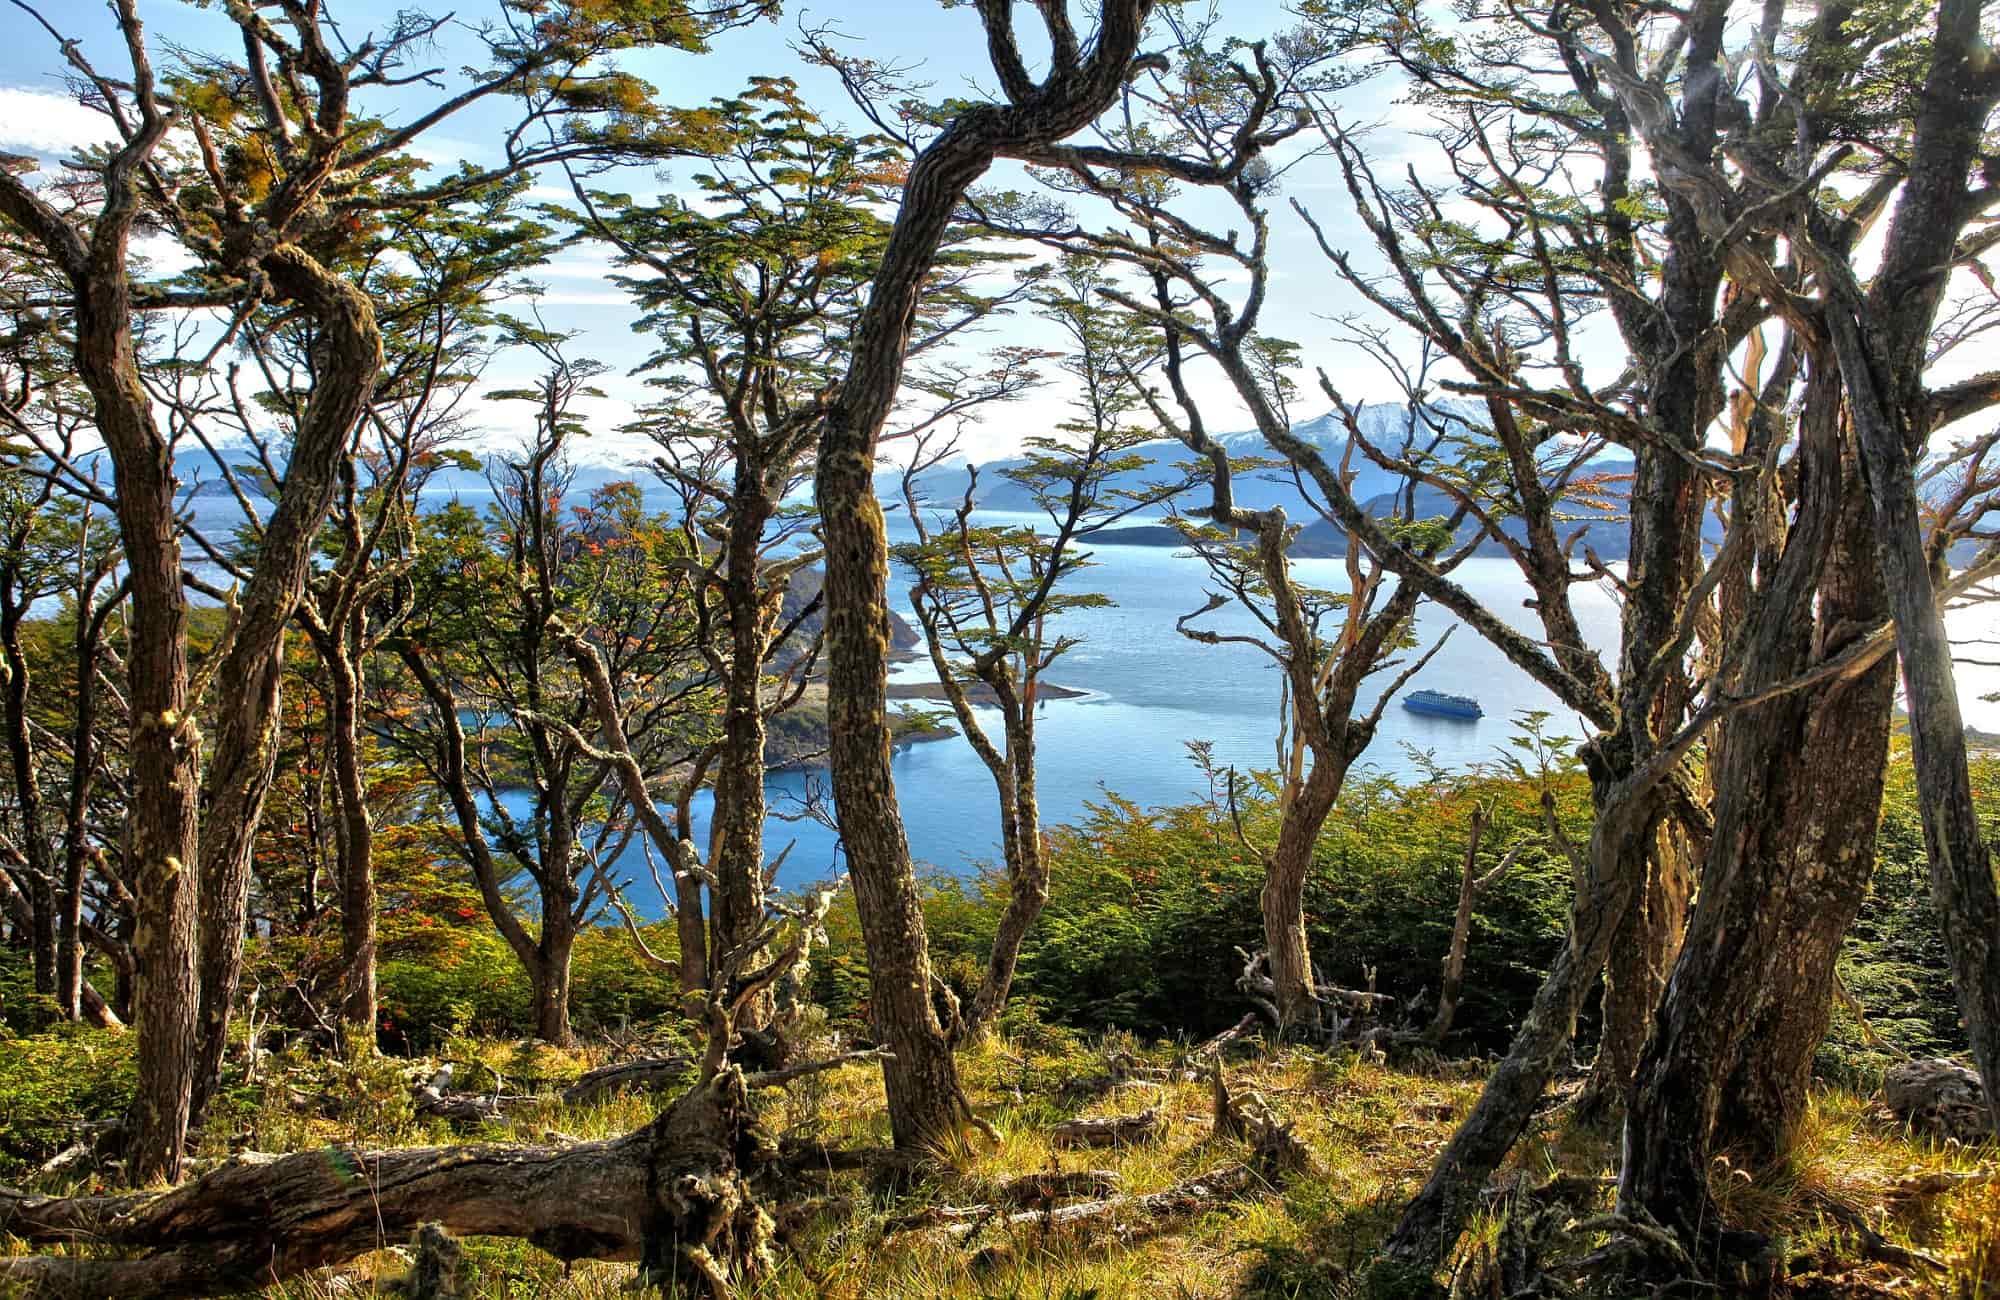 Croisière Ile Navarino - Baie de Wulaia - Amplitudes